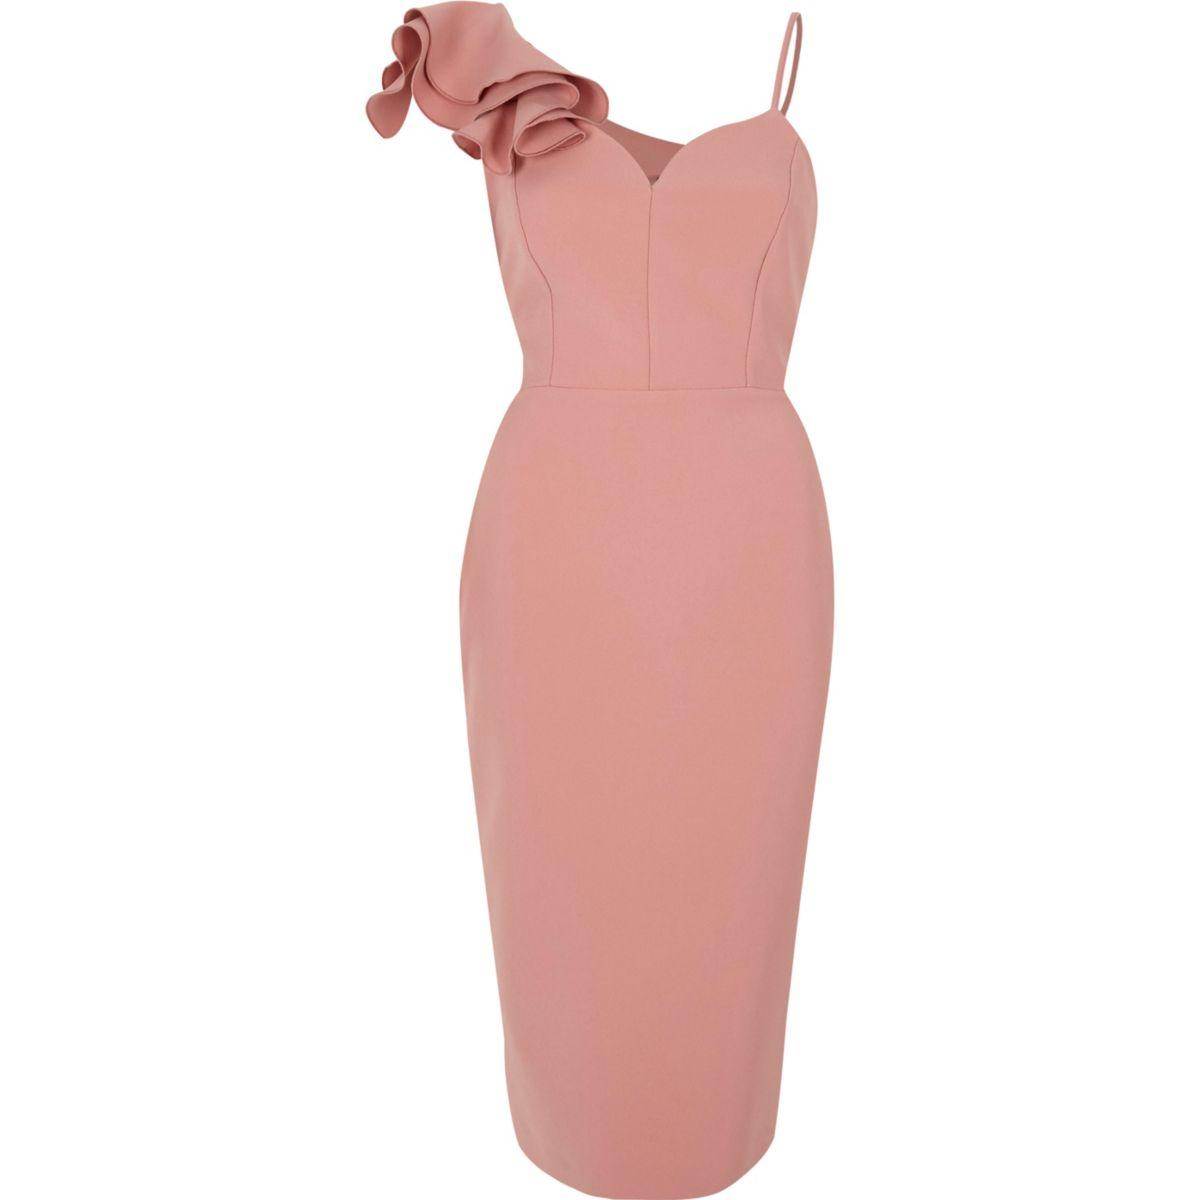 Light pink frill shoulder bodycon midi dress